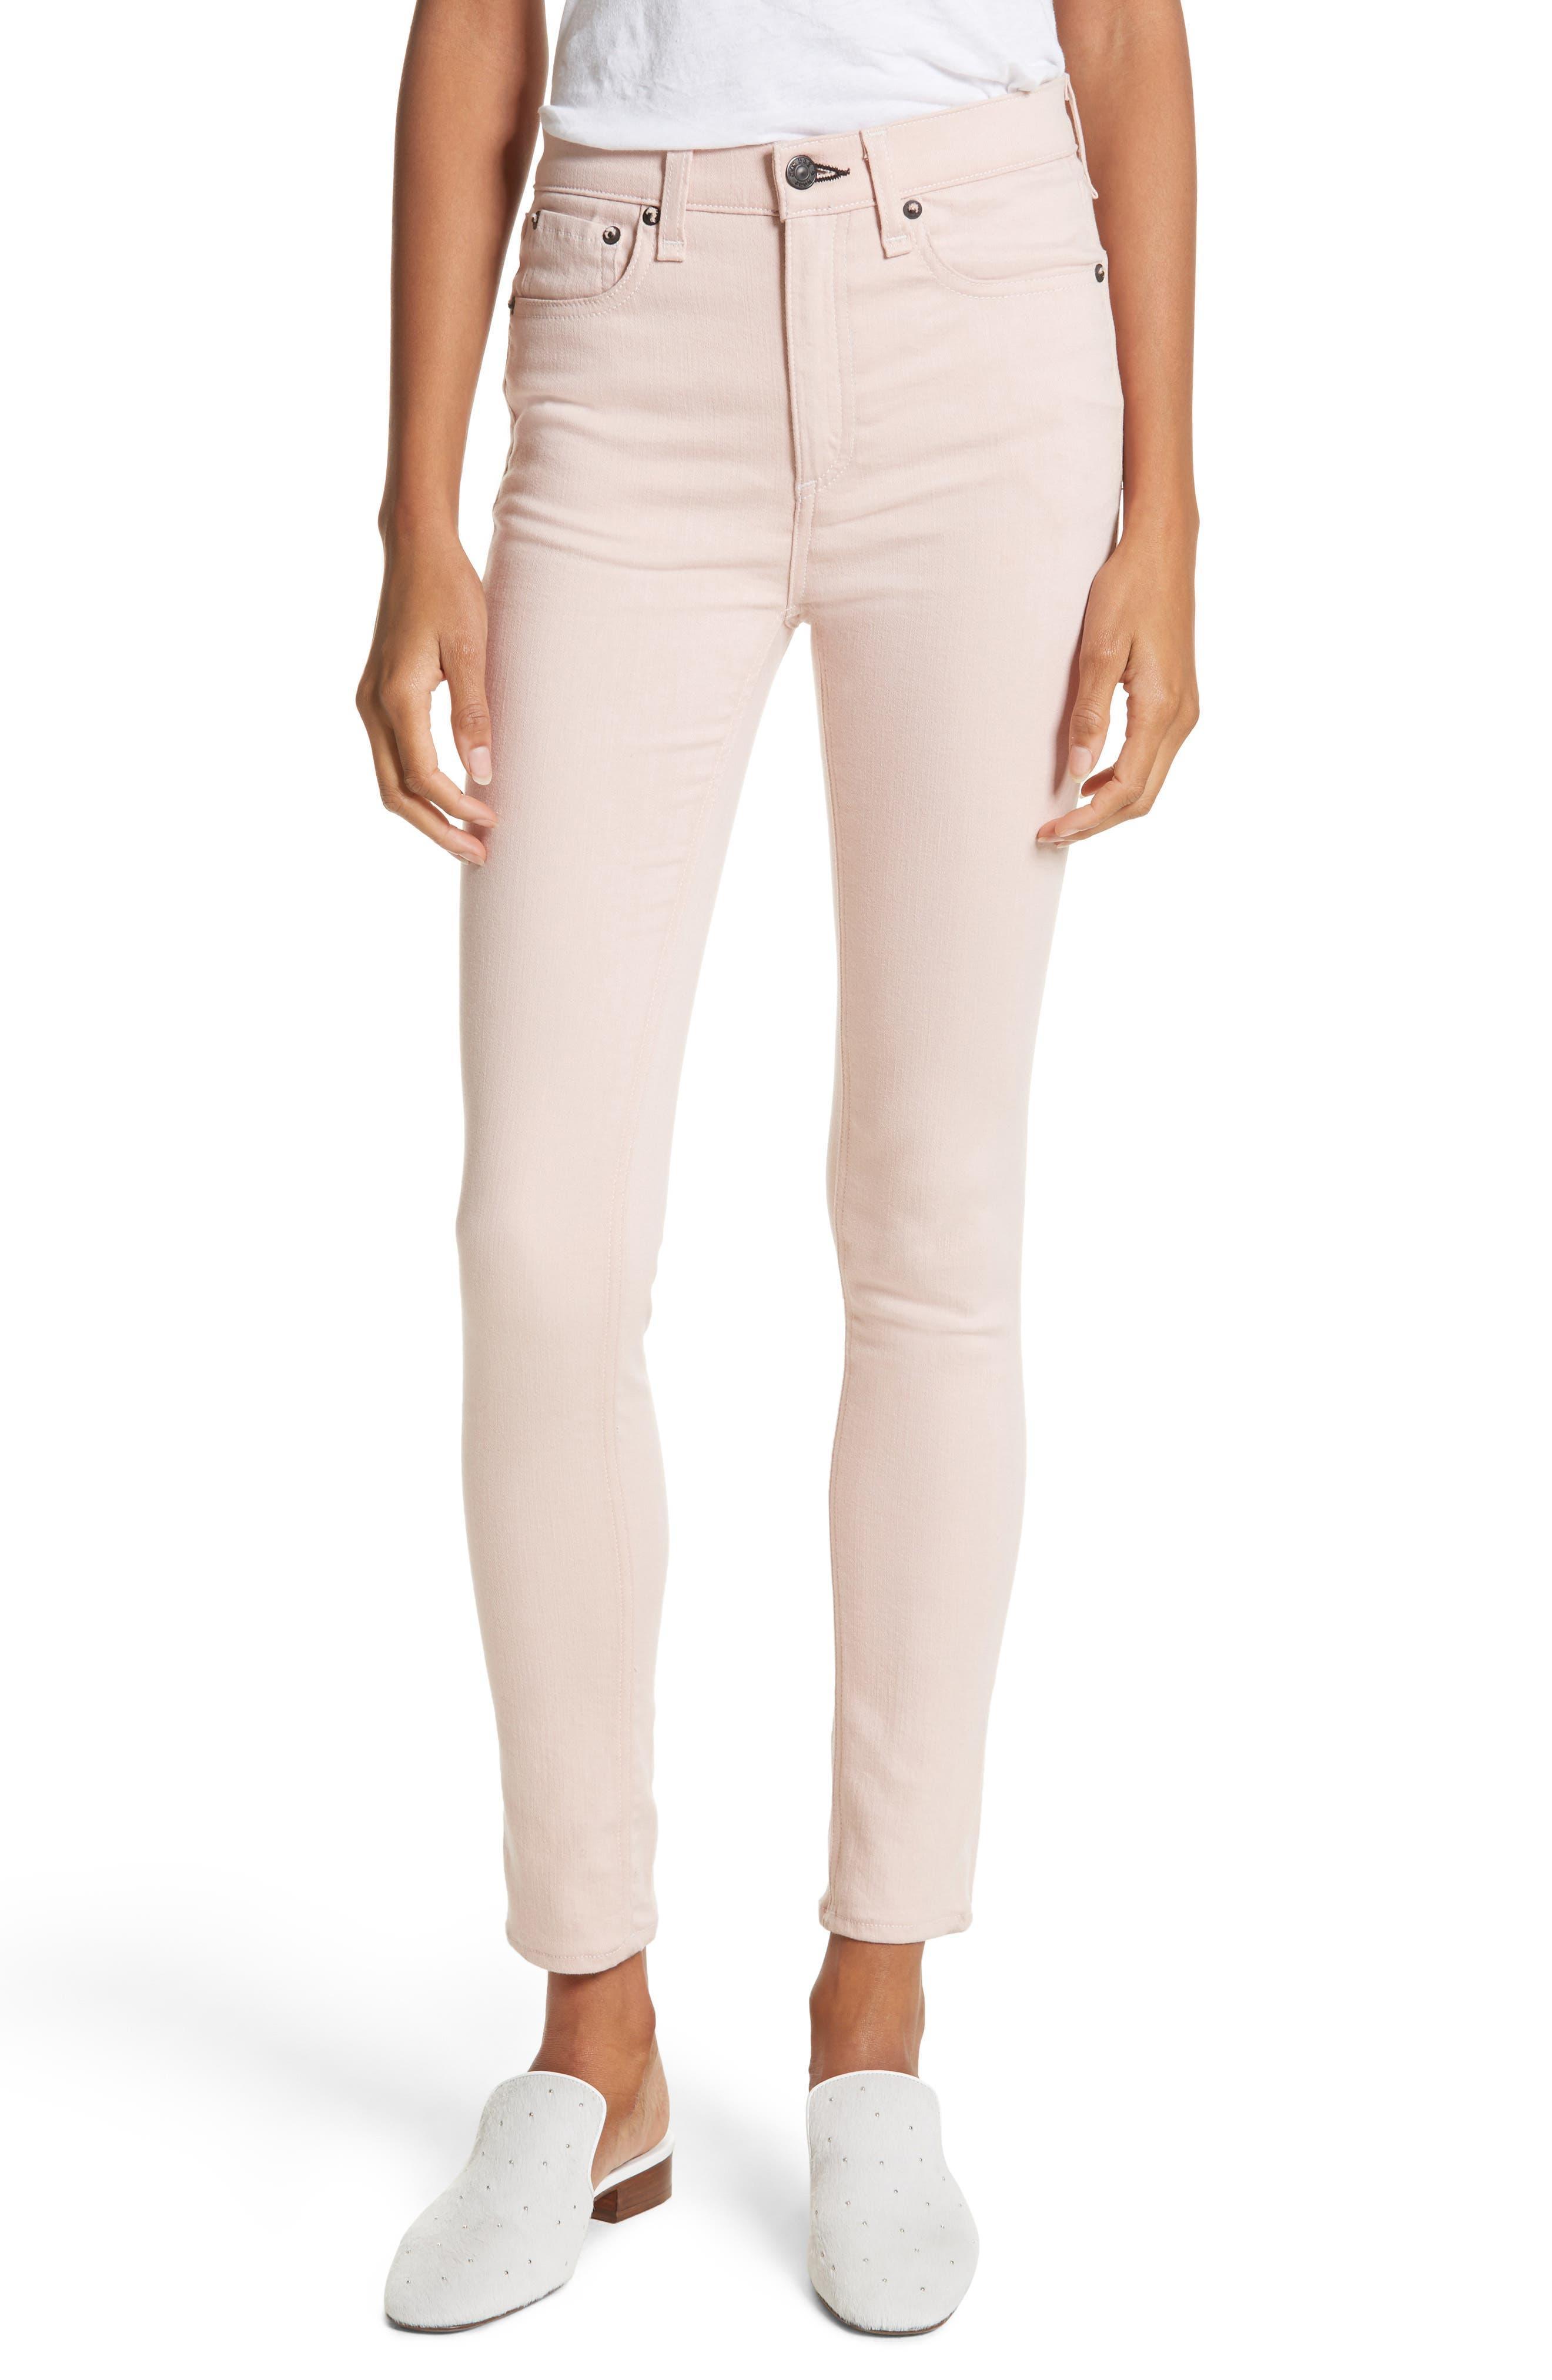 Alternate Image 1 Selected - rag & bone/JEAN High Waist Ankle Skinny Jeans (Blush Twill)